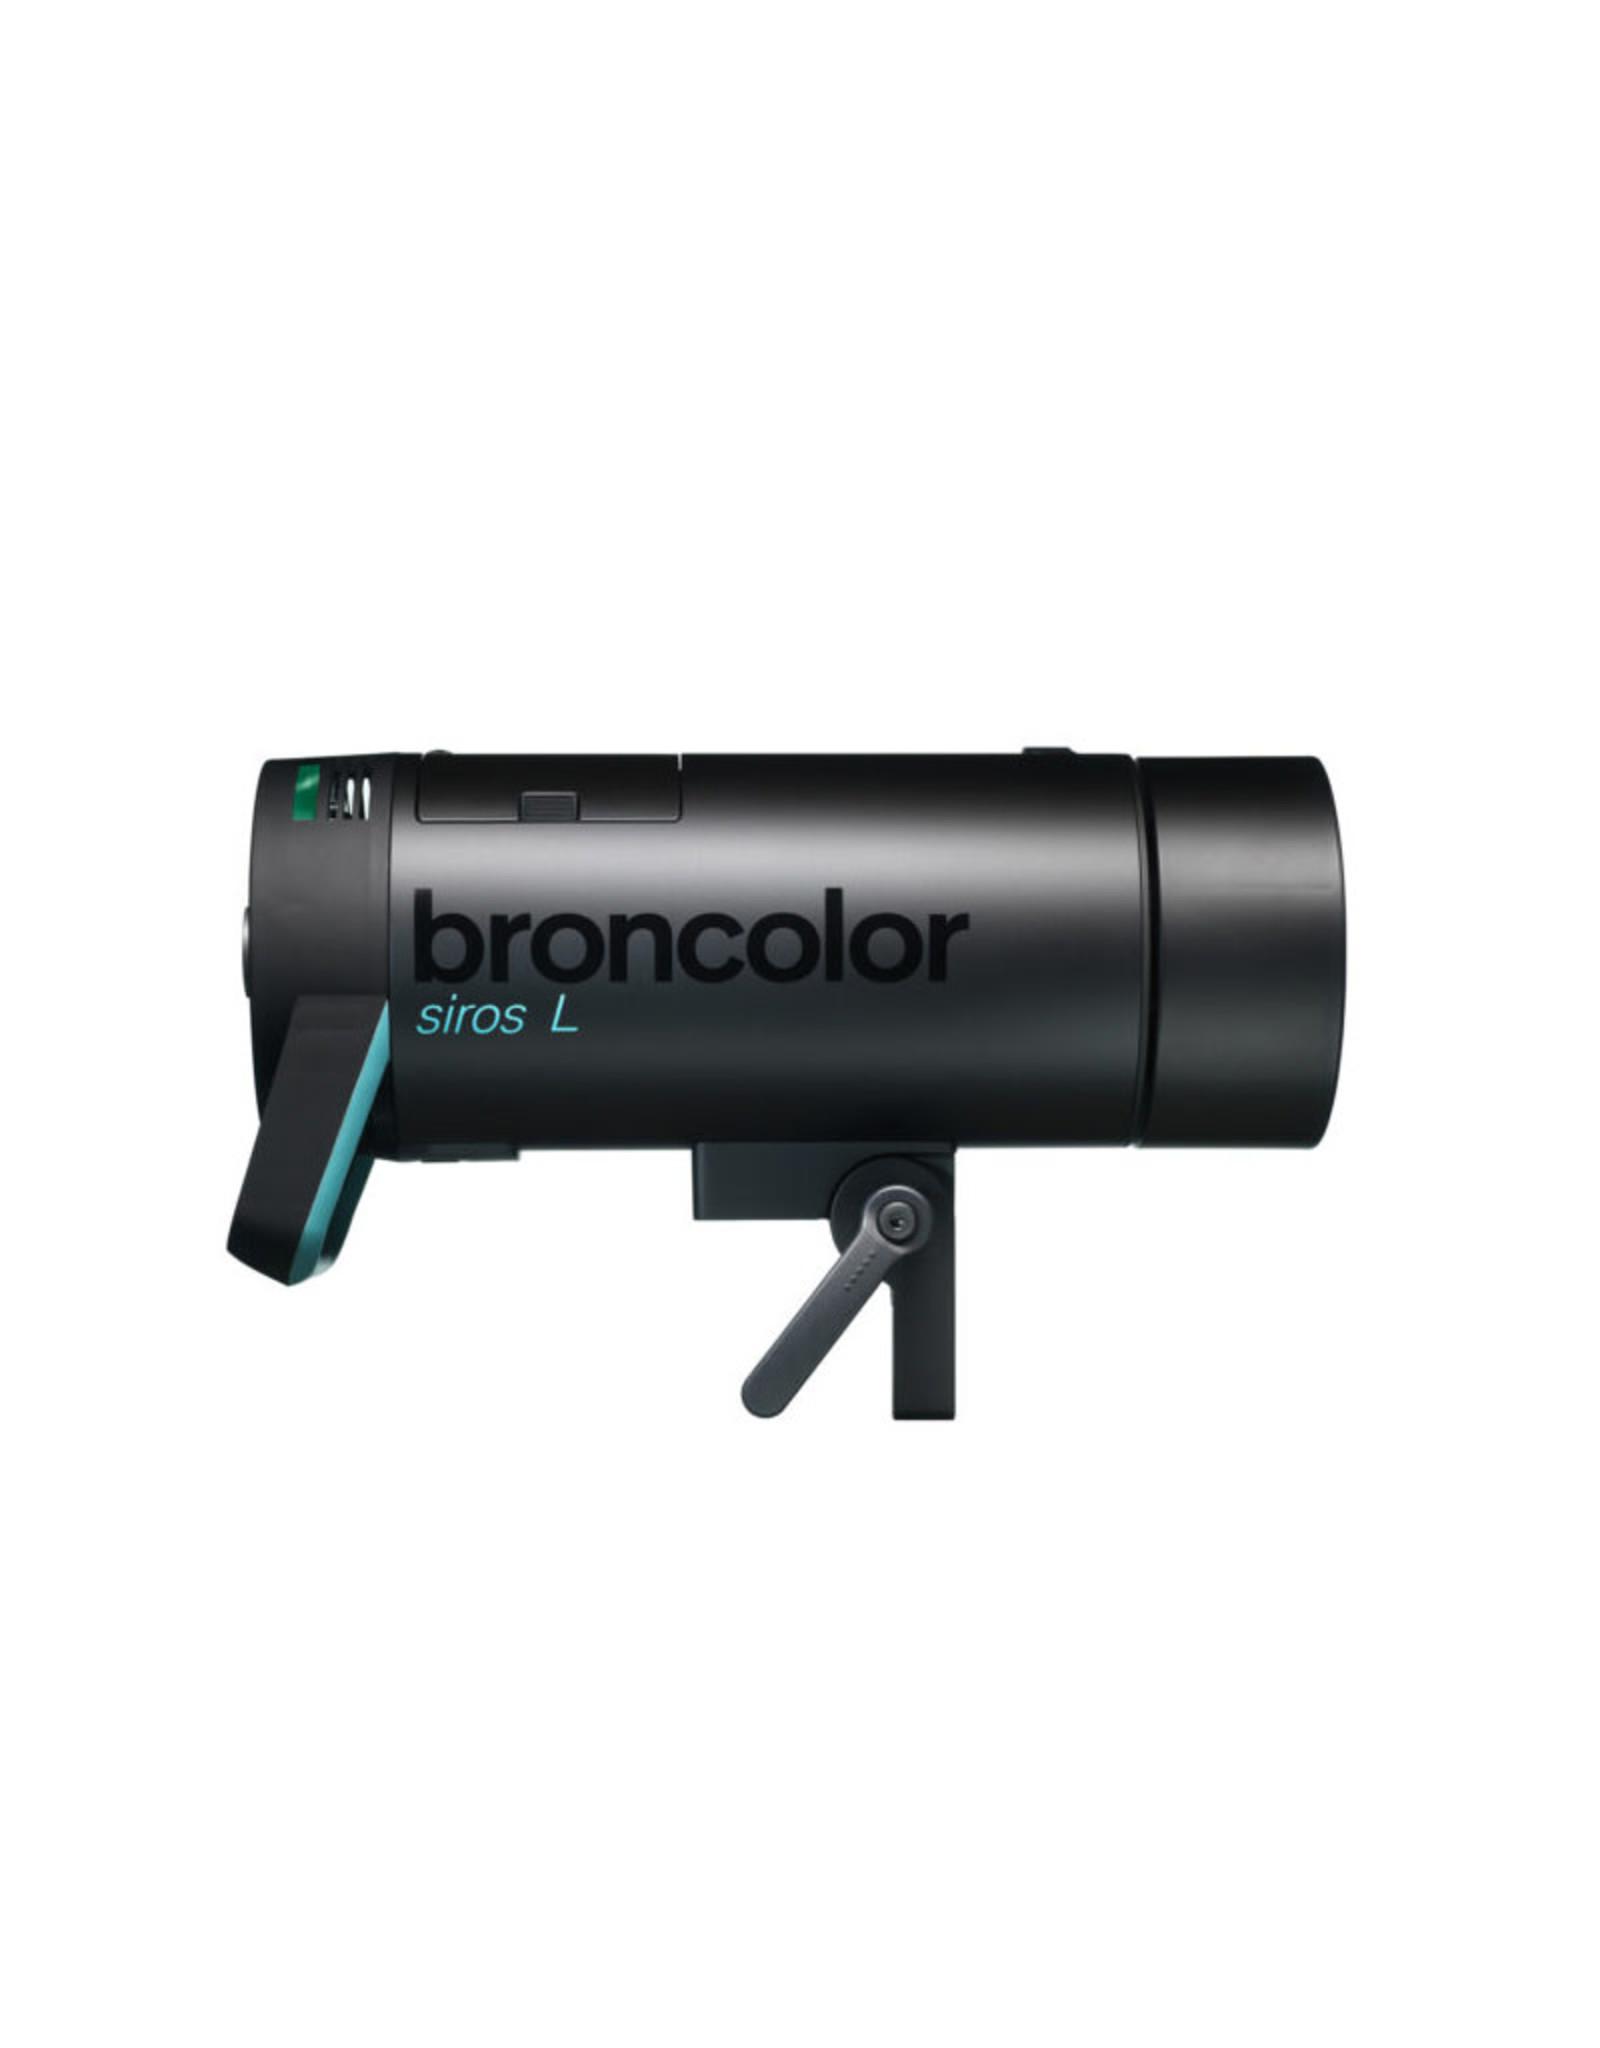 Broncolor Broncolor Siros 800L WiFi/RFS 2